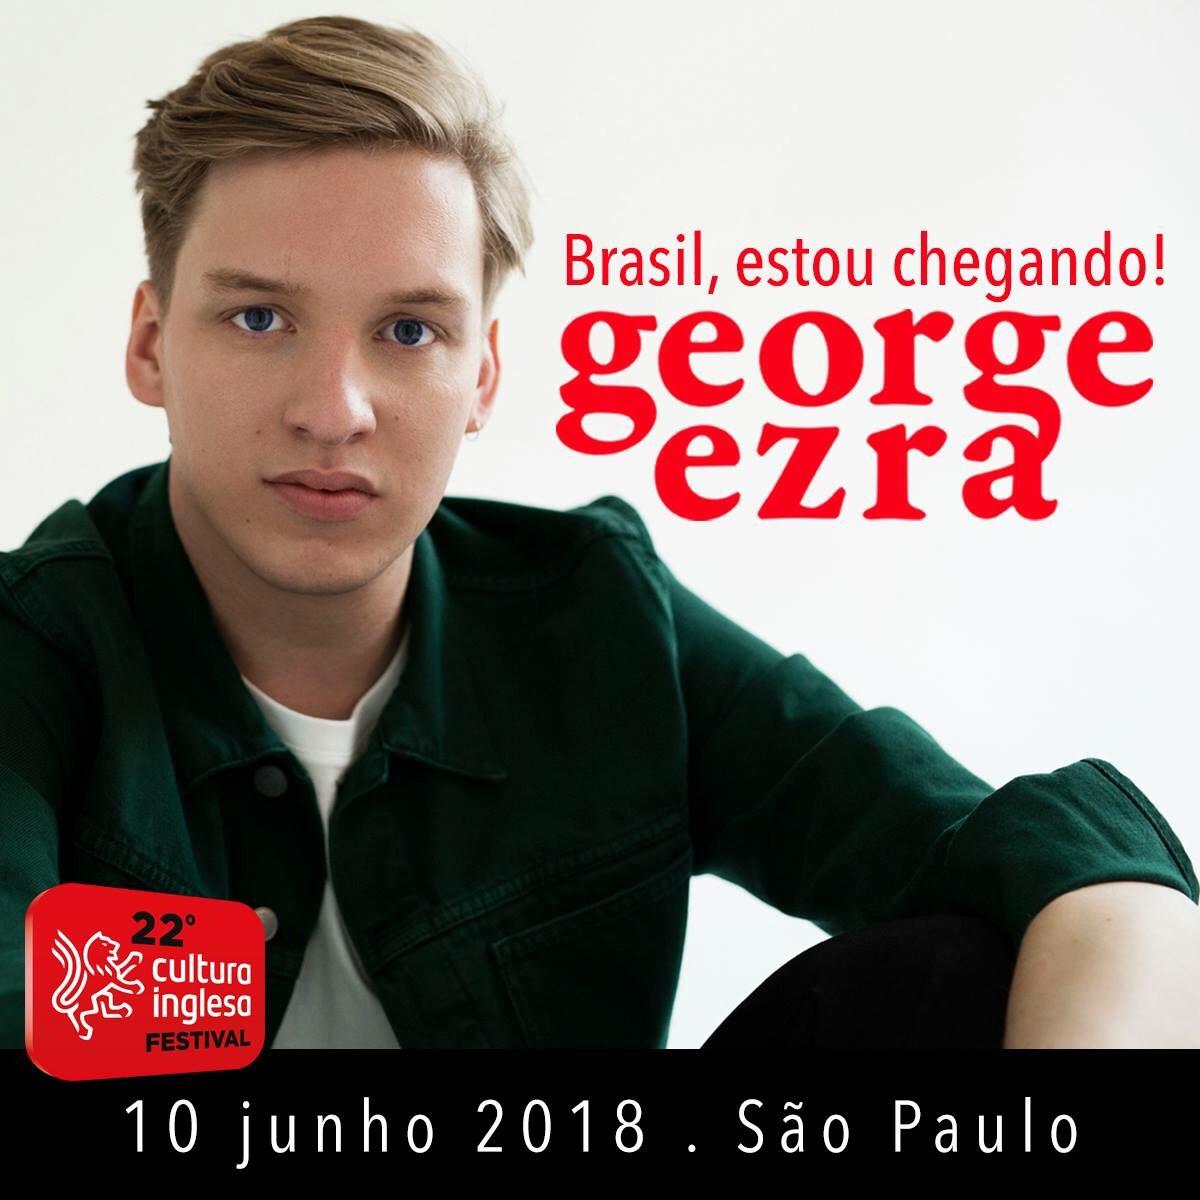 George Ezra Cultura Inglesa Festival